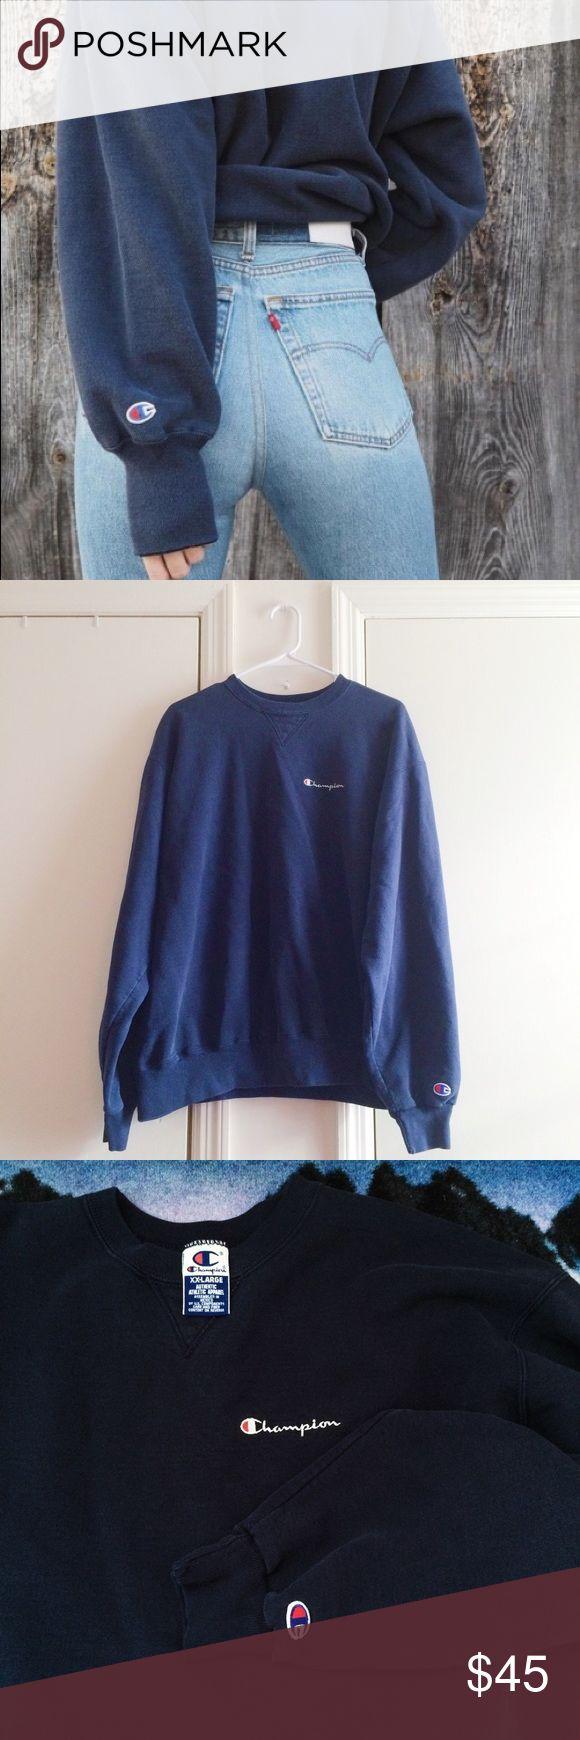 Champion Navy Blue Sweatshirt Champion Navy Blue Sweatshirt. Has Champion written on chest and small logo on arm sleeve. In new condition. Champion Tops Sweatshirts & Hoodies